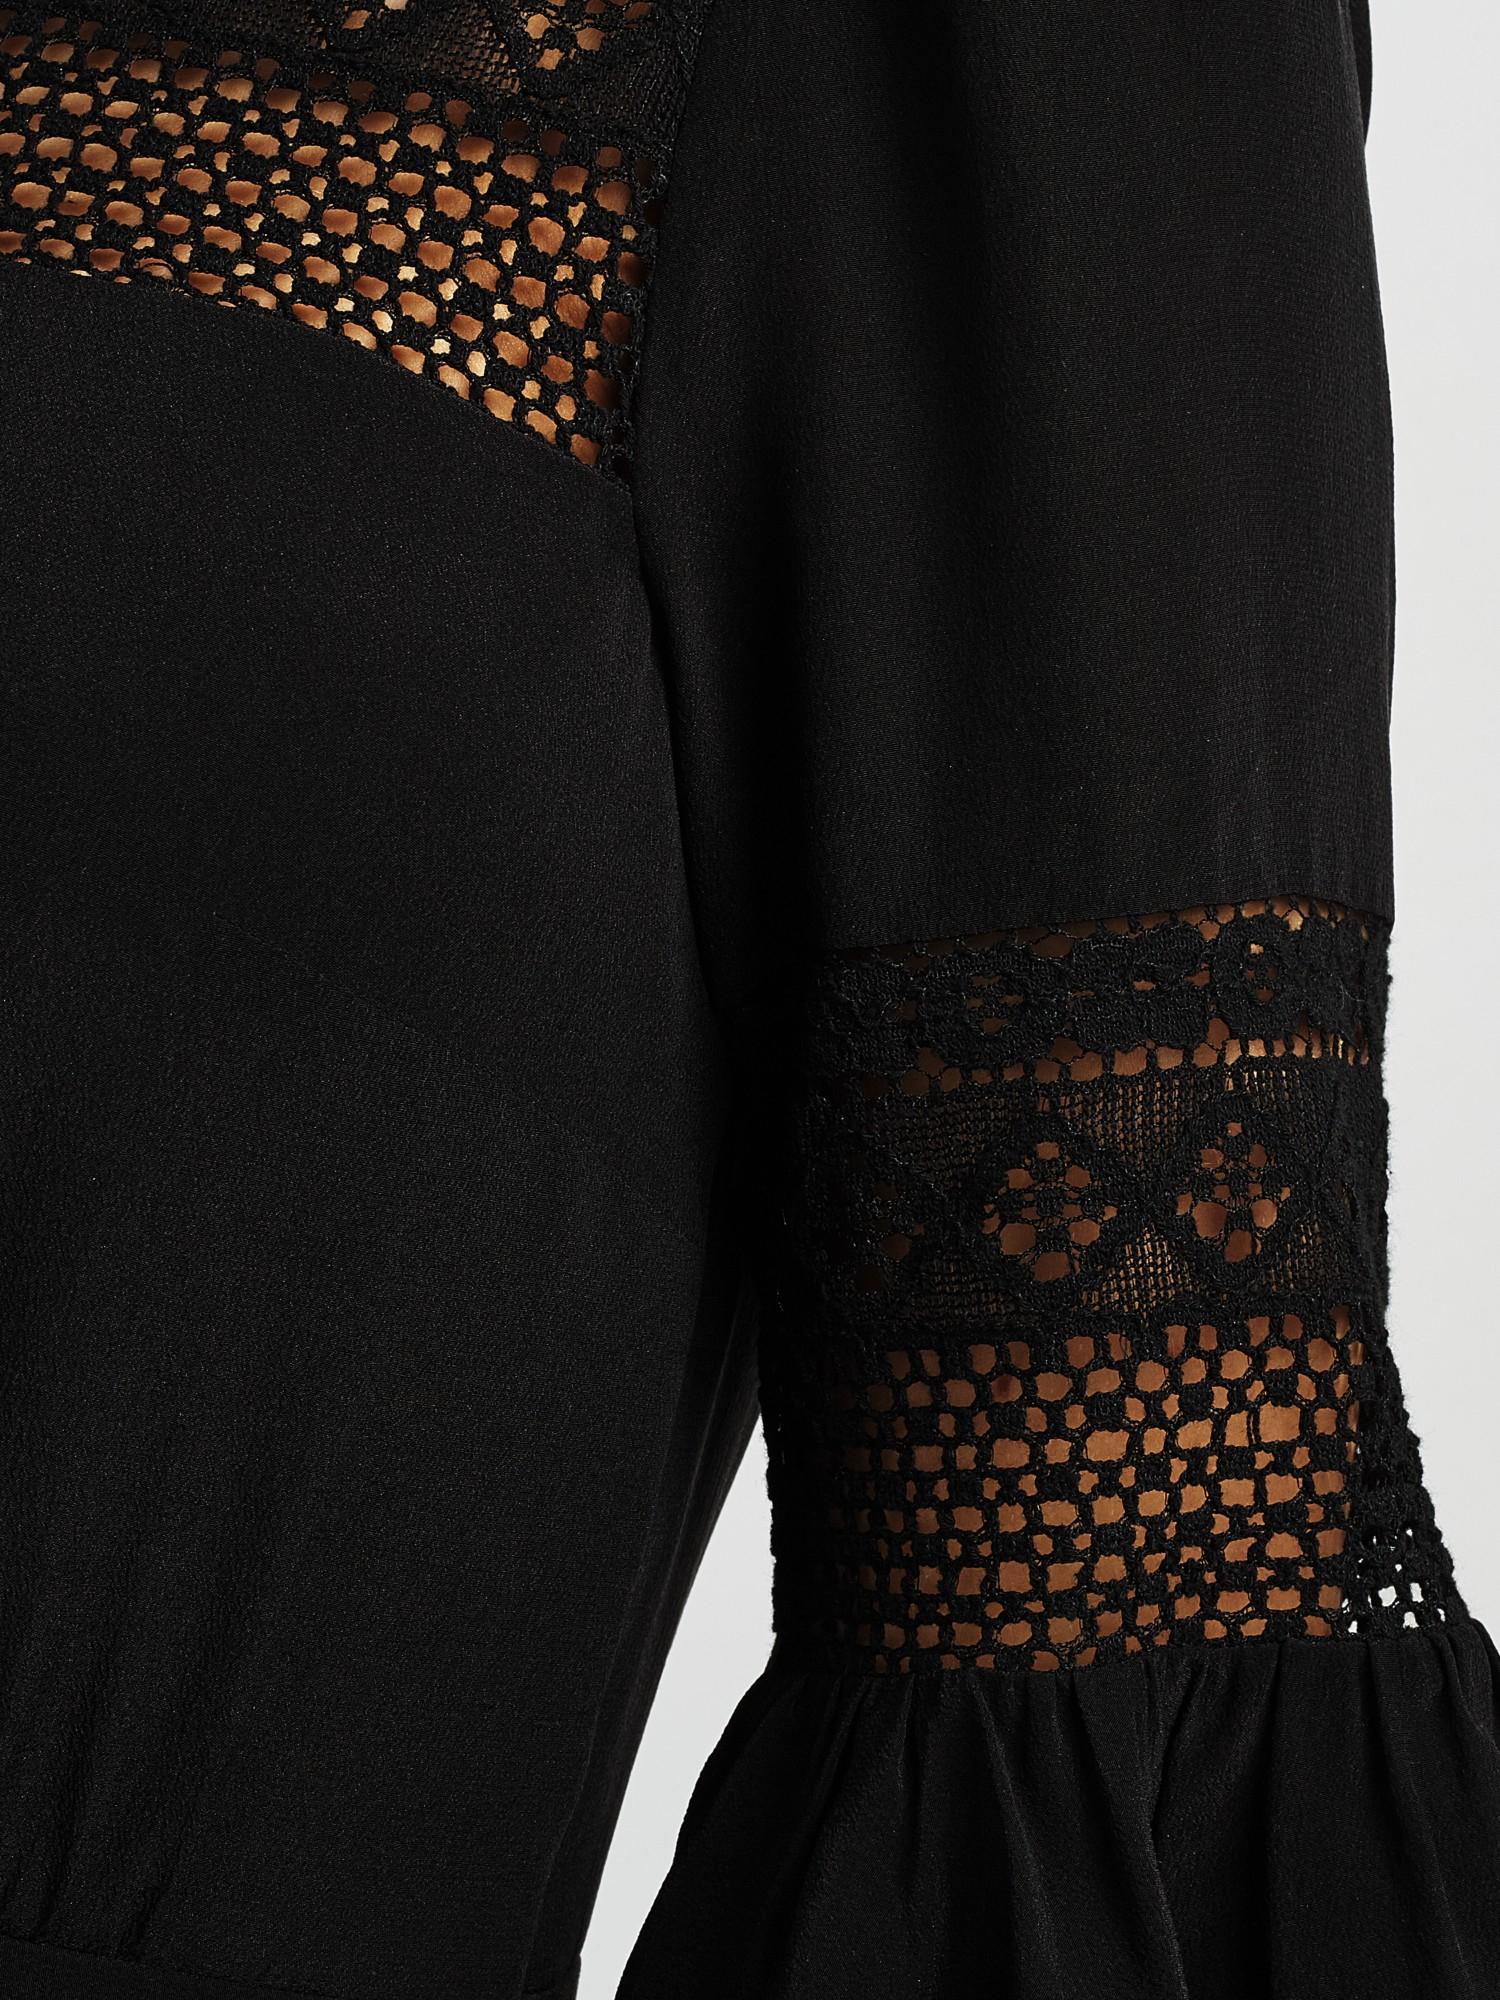 Black lace alice temperley dress